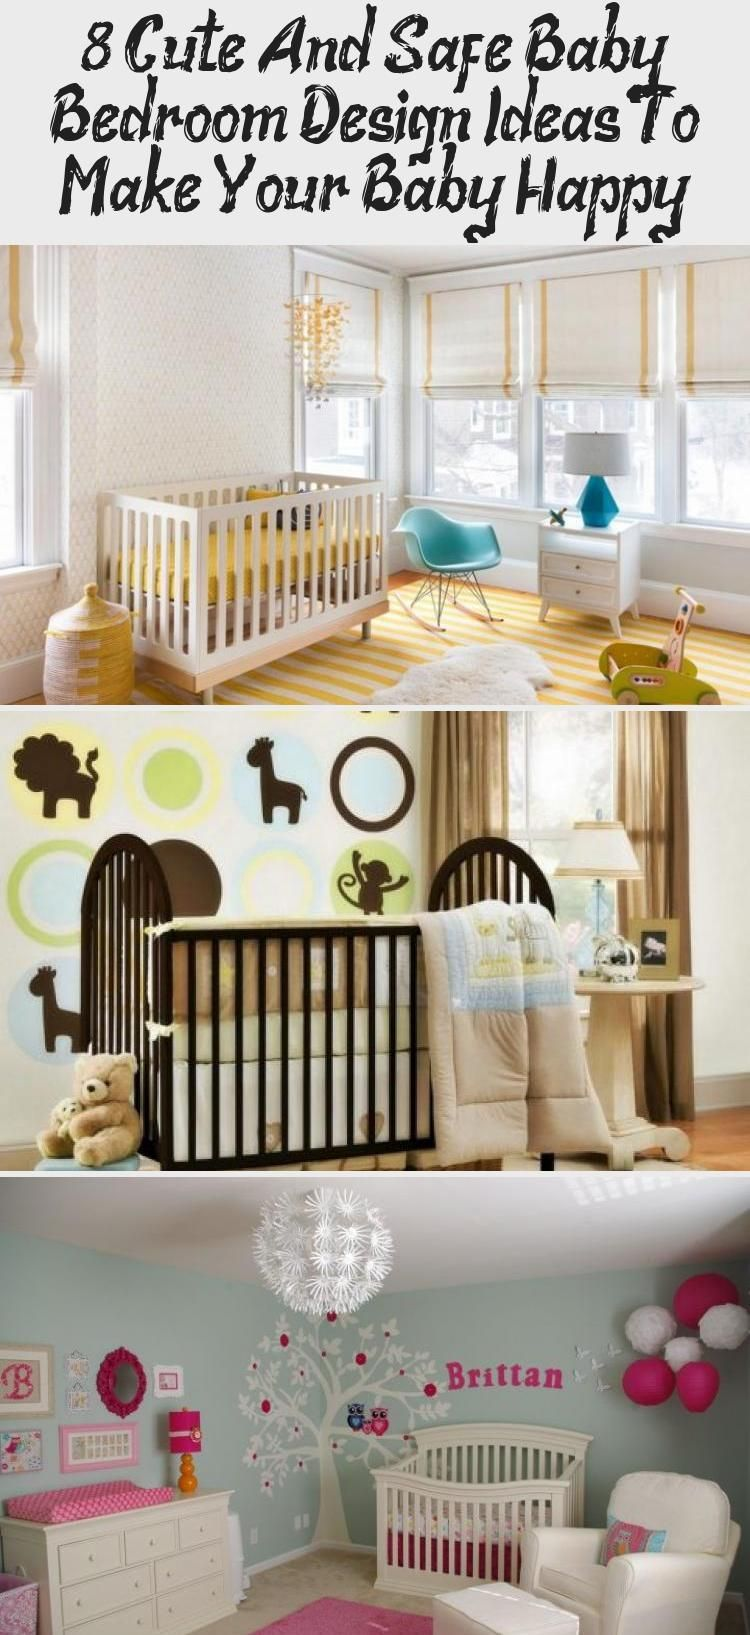 Grau Baby Schlafzimmer Design Ideen Baby Nurserygreyyellow Baby